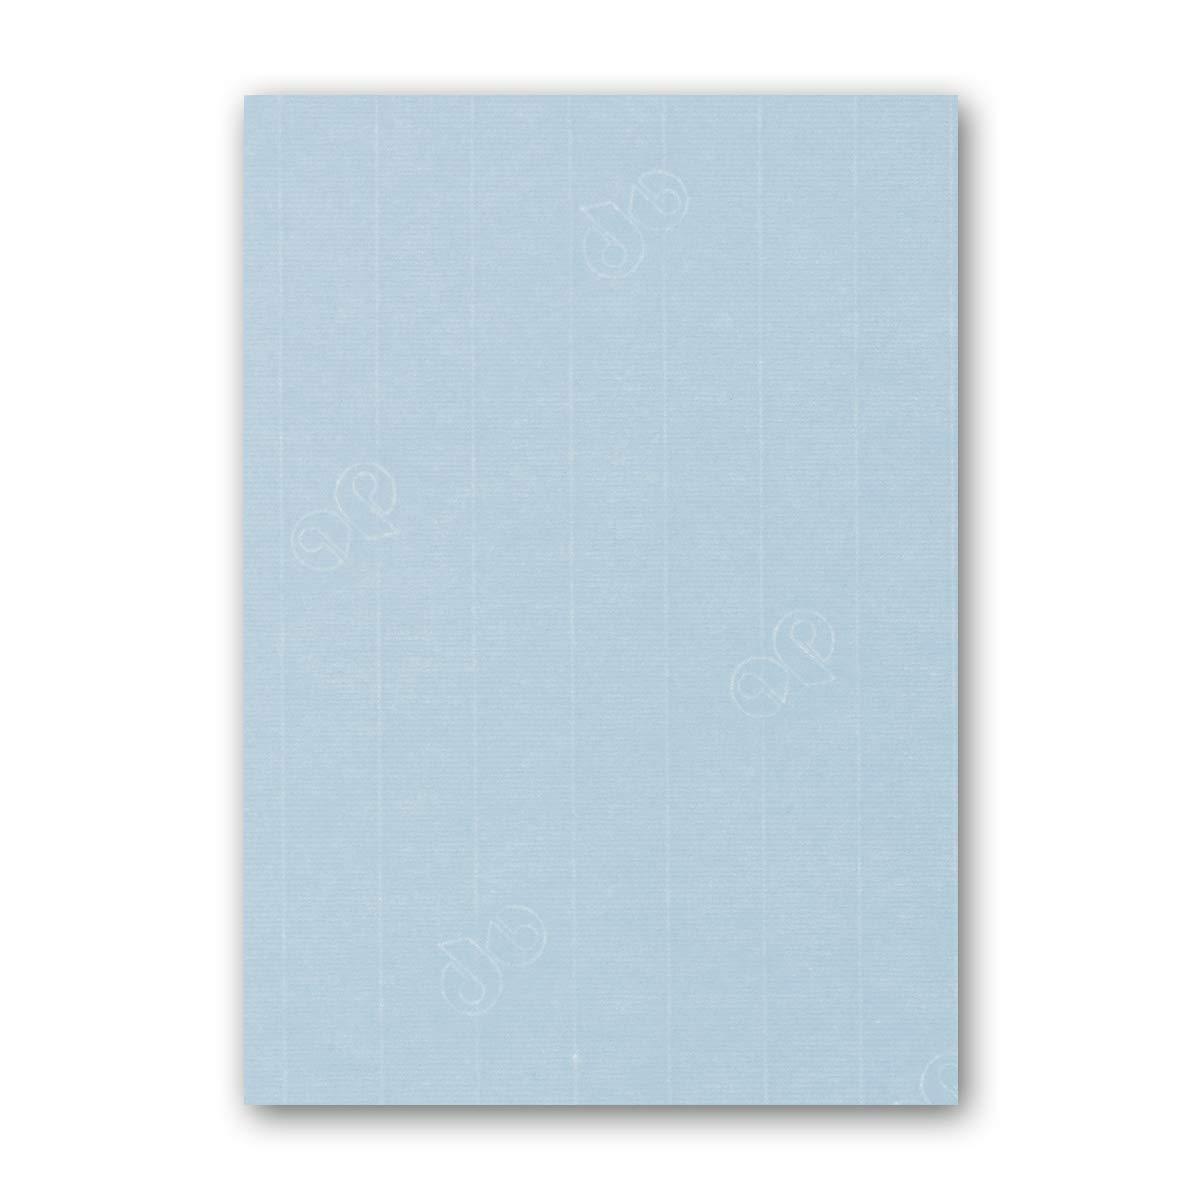 ARTOZ 150x Briefpapier + Bastelpapier Bastelkarton - Taupe - DIN A4 297 x 210 mm – Edle Egoutteur-Rippung – Hochwertiges 220 g m² Tonpapier – Scrapbooking Papier 413 - Pastelblau 100 Stück